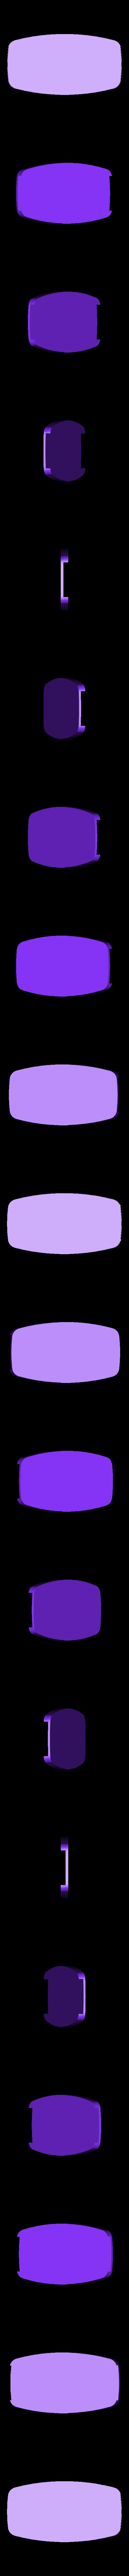 logo_TOTAL_70_cadre_bleu.STL Download free STL file TOTAL logo 1970 • Template to 3D print, lulu3Dbuilder